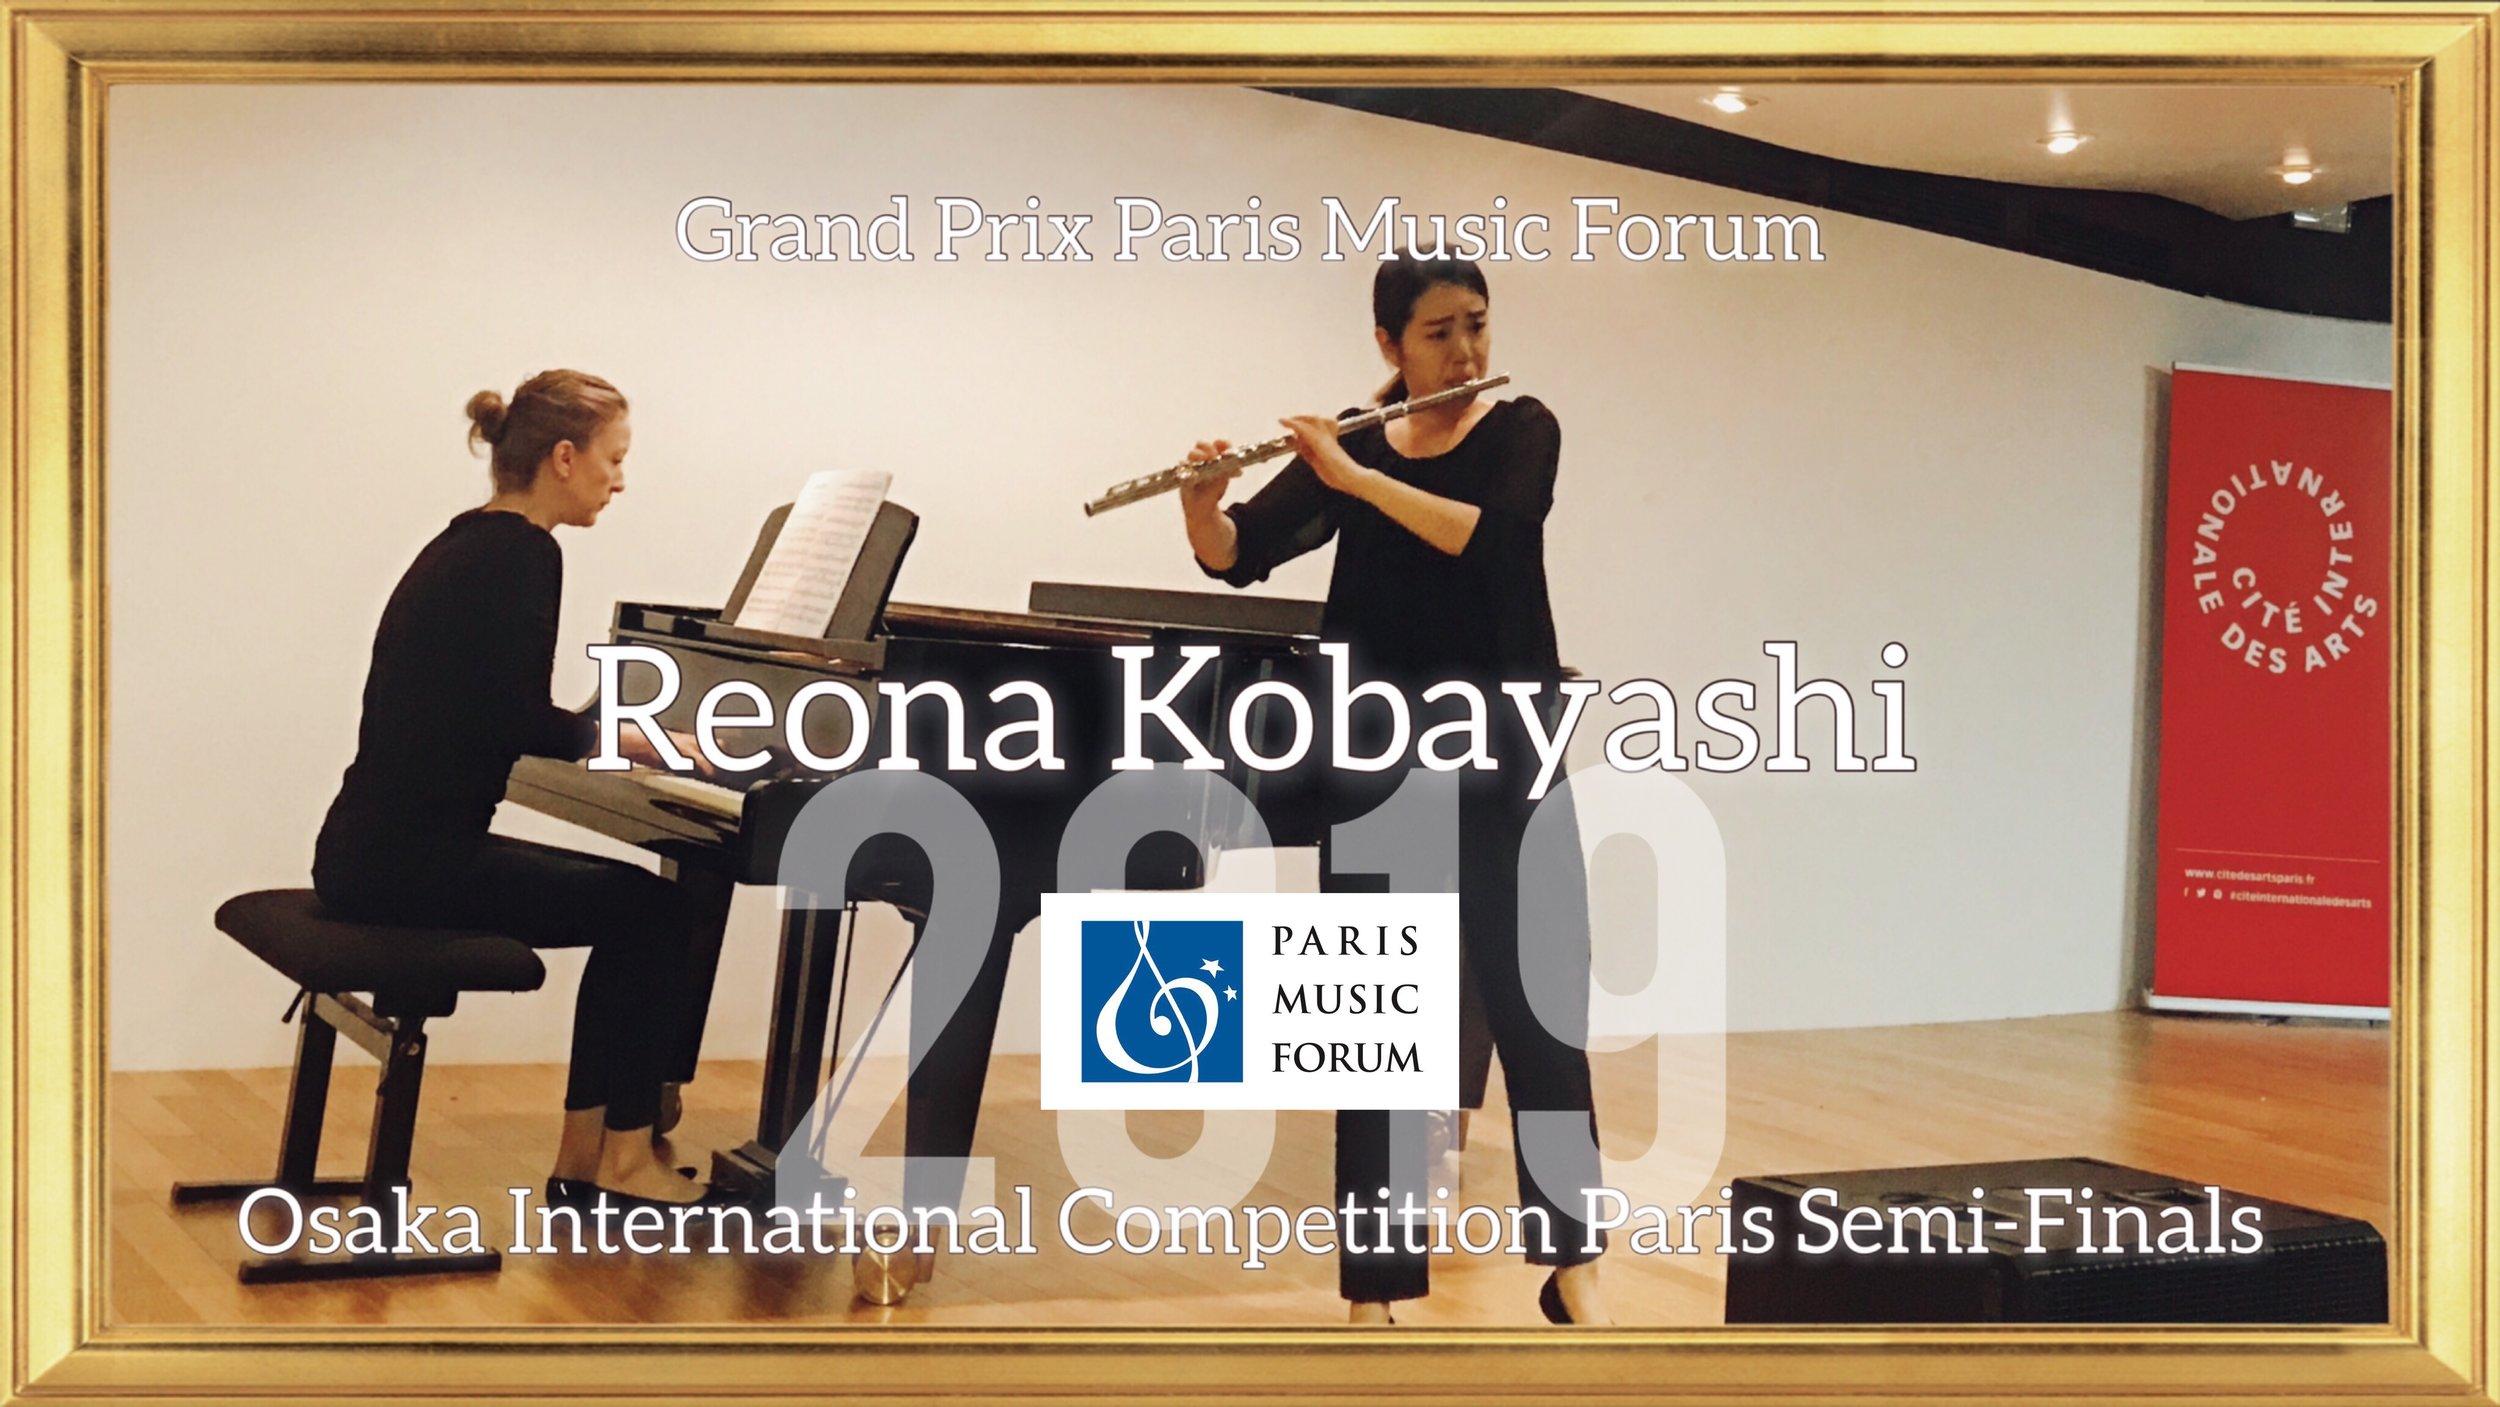 G r a n d P r i x   Paris Music Forum - Osaka International Competition Paris Semi-Finals 2019   R e o n a  K O B A Y A S H I   Diplôme et Un Chèque de 500 (cinq cents) Euros